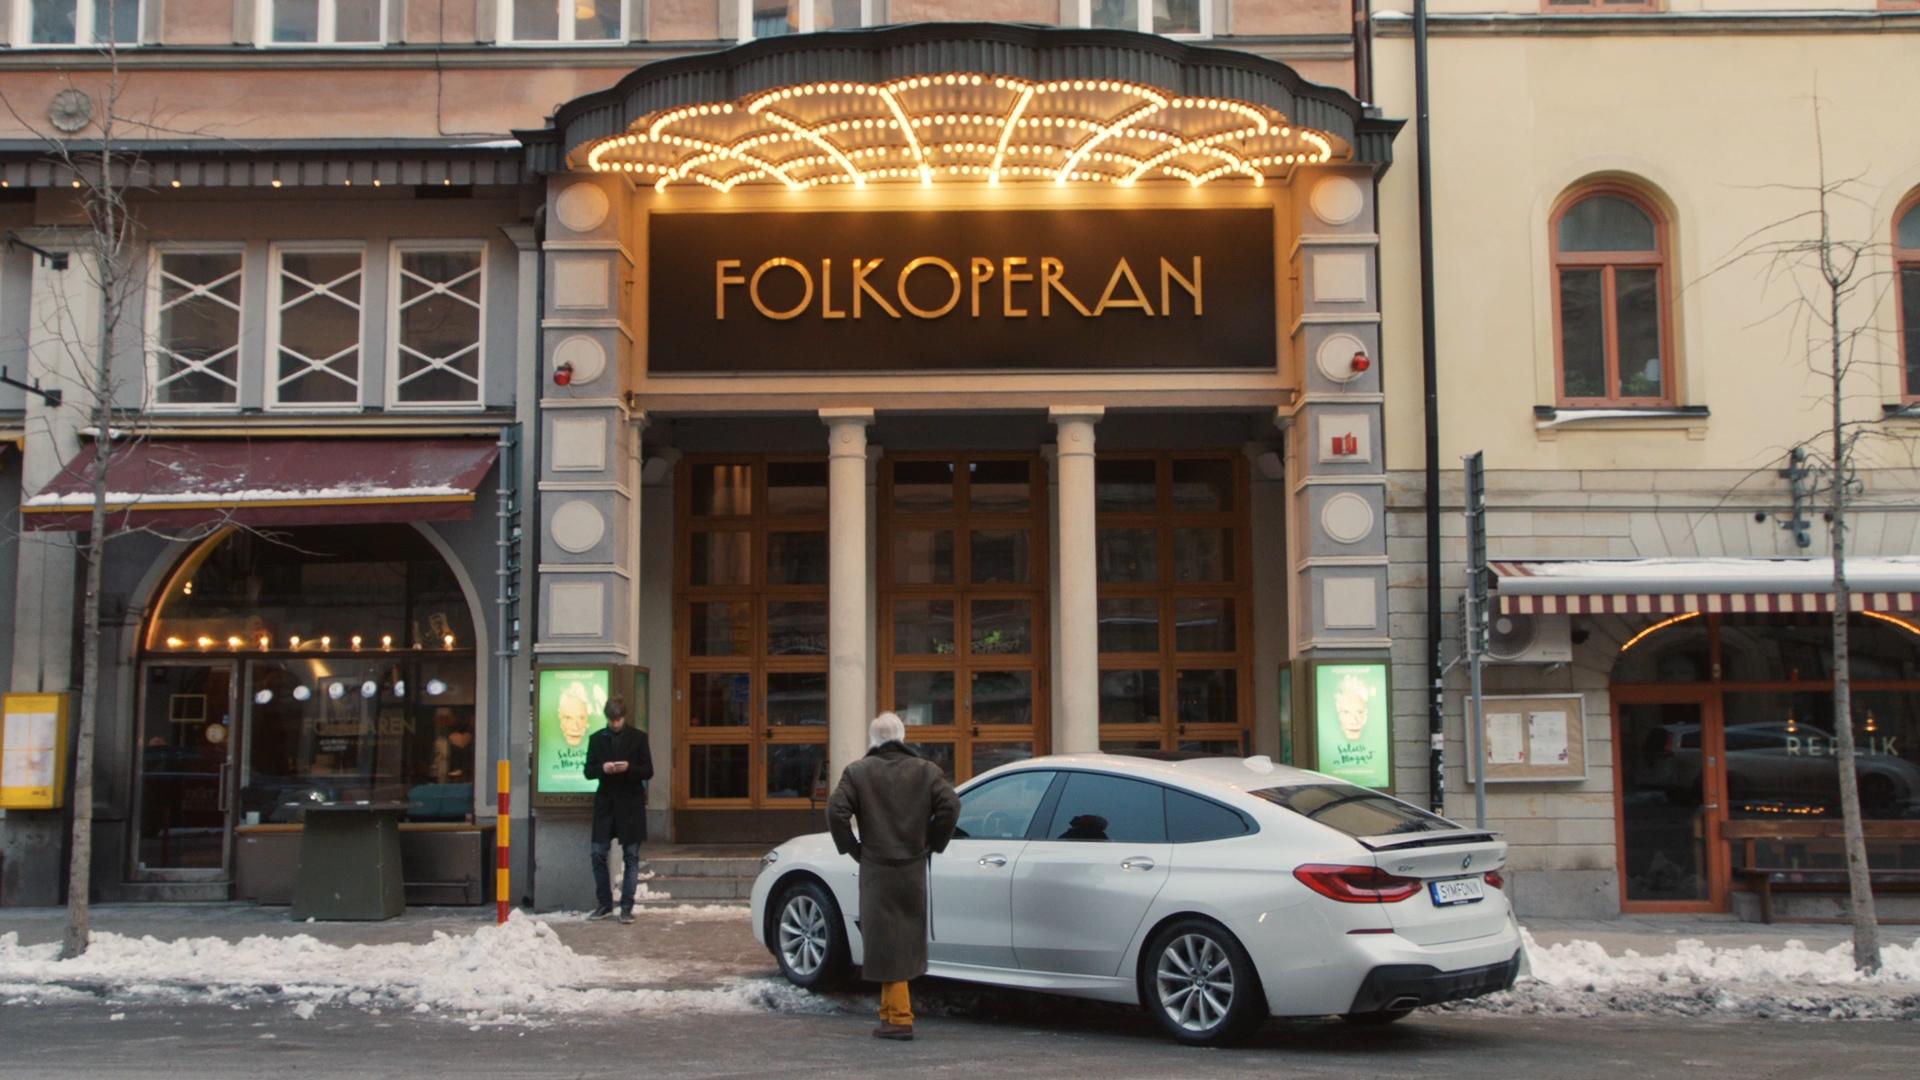 Folkoperan - Mozart vs Salieri